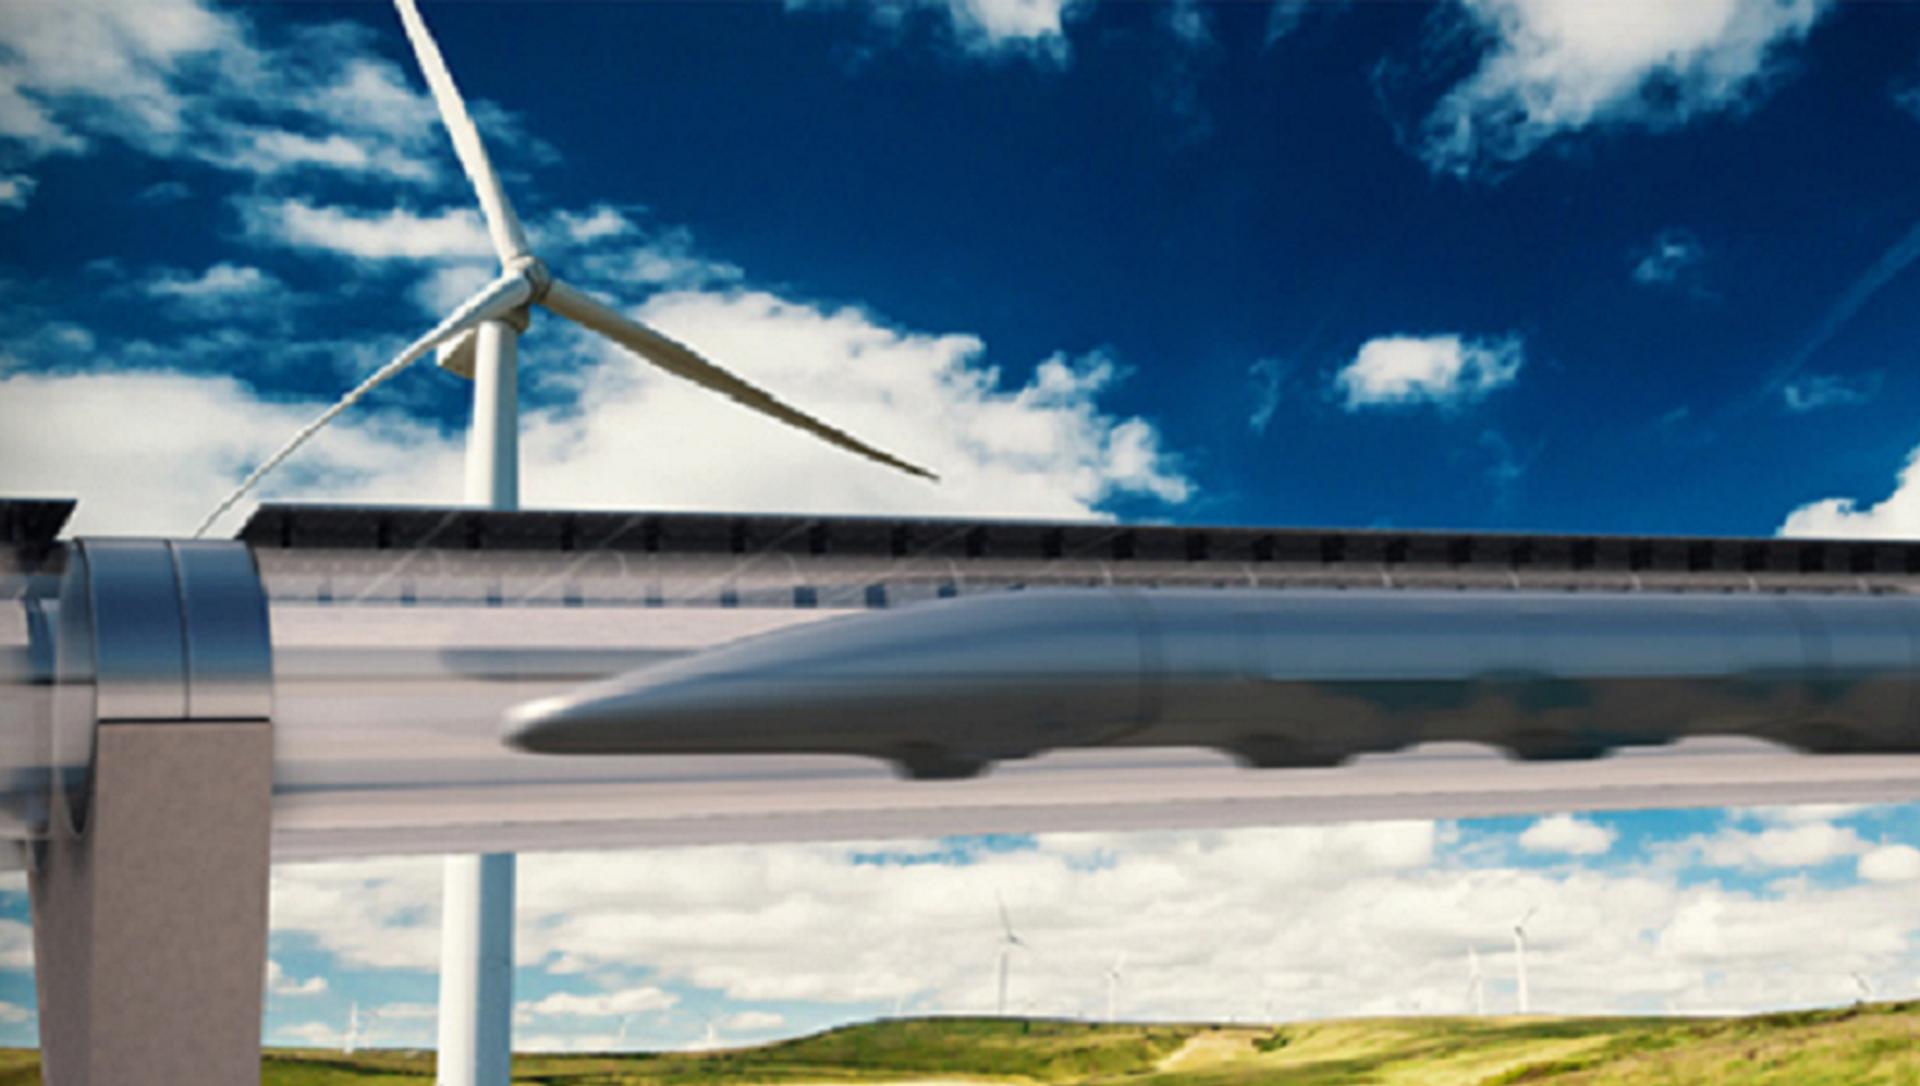 Hyperloop può arrivare in Italia: Roma-Milano in 30 minuti - Sputnik Italia, 1920, 11.02.2021